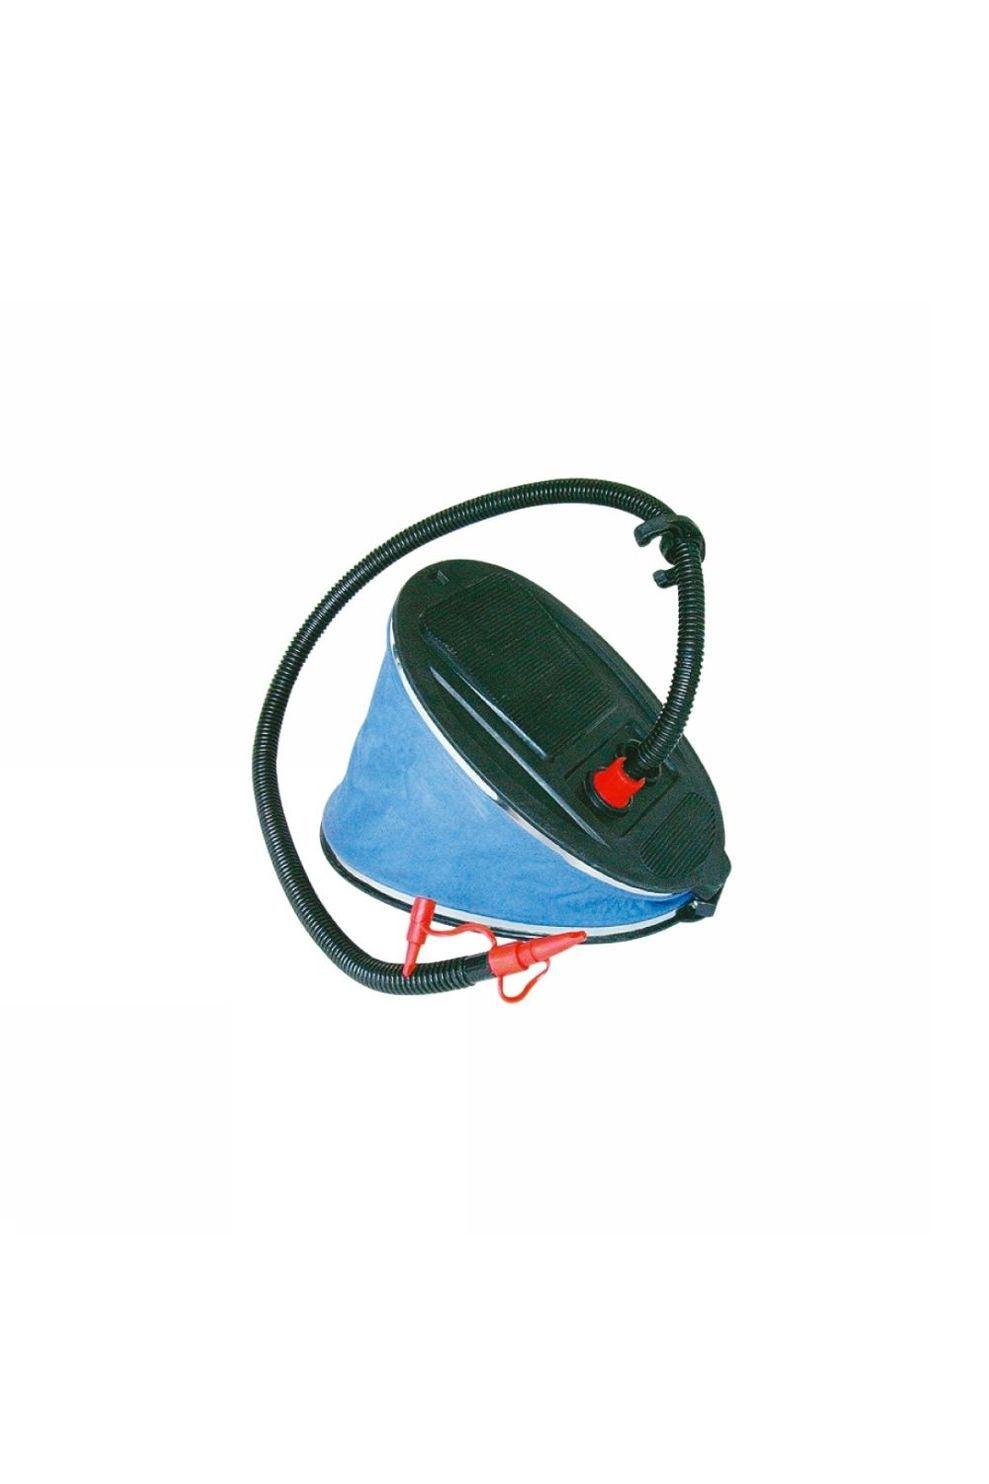 Transfilco Pomp 5l - Geel/Zwart